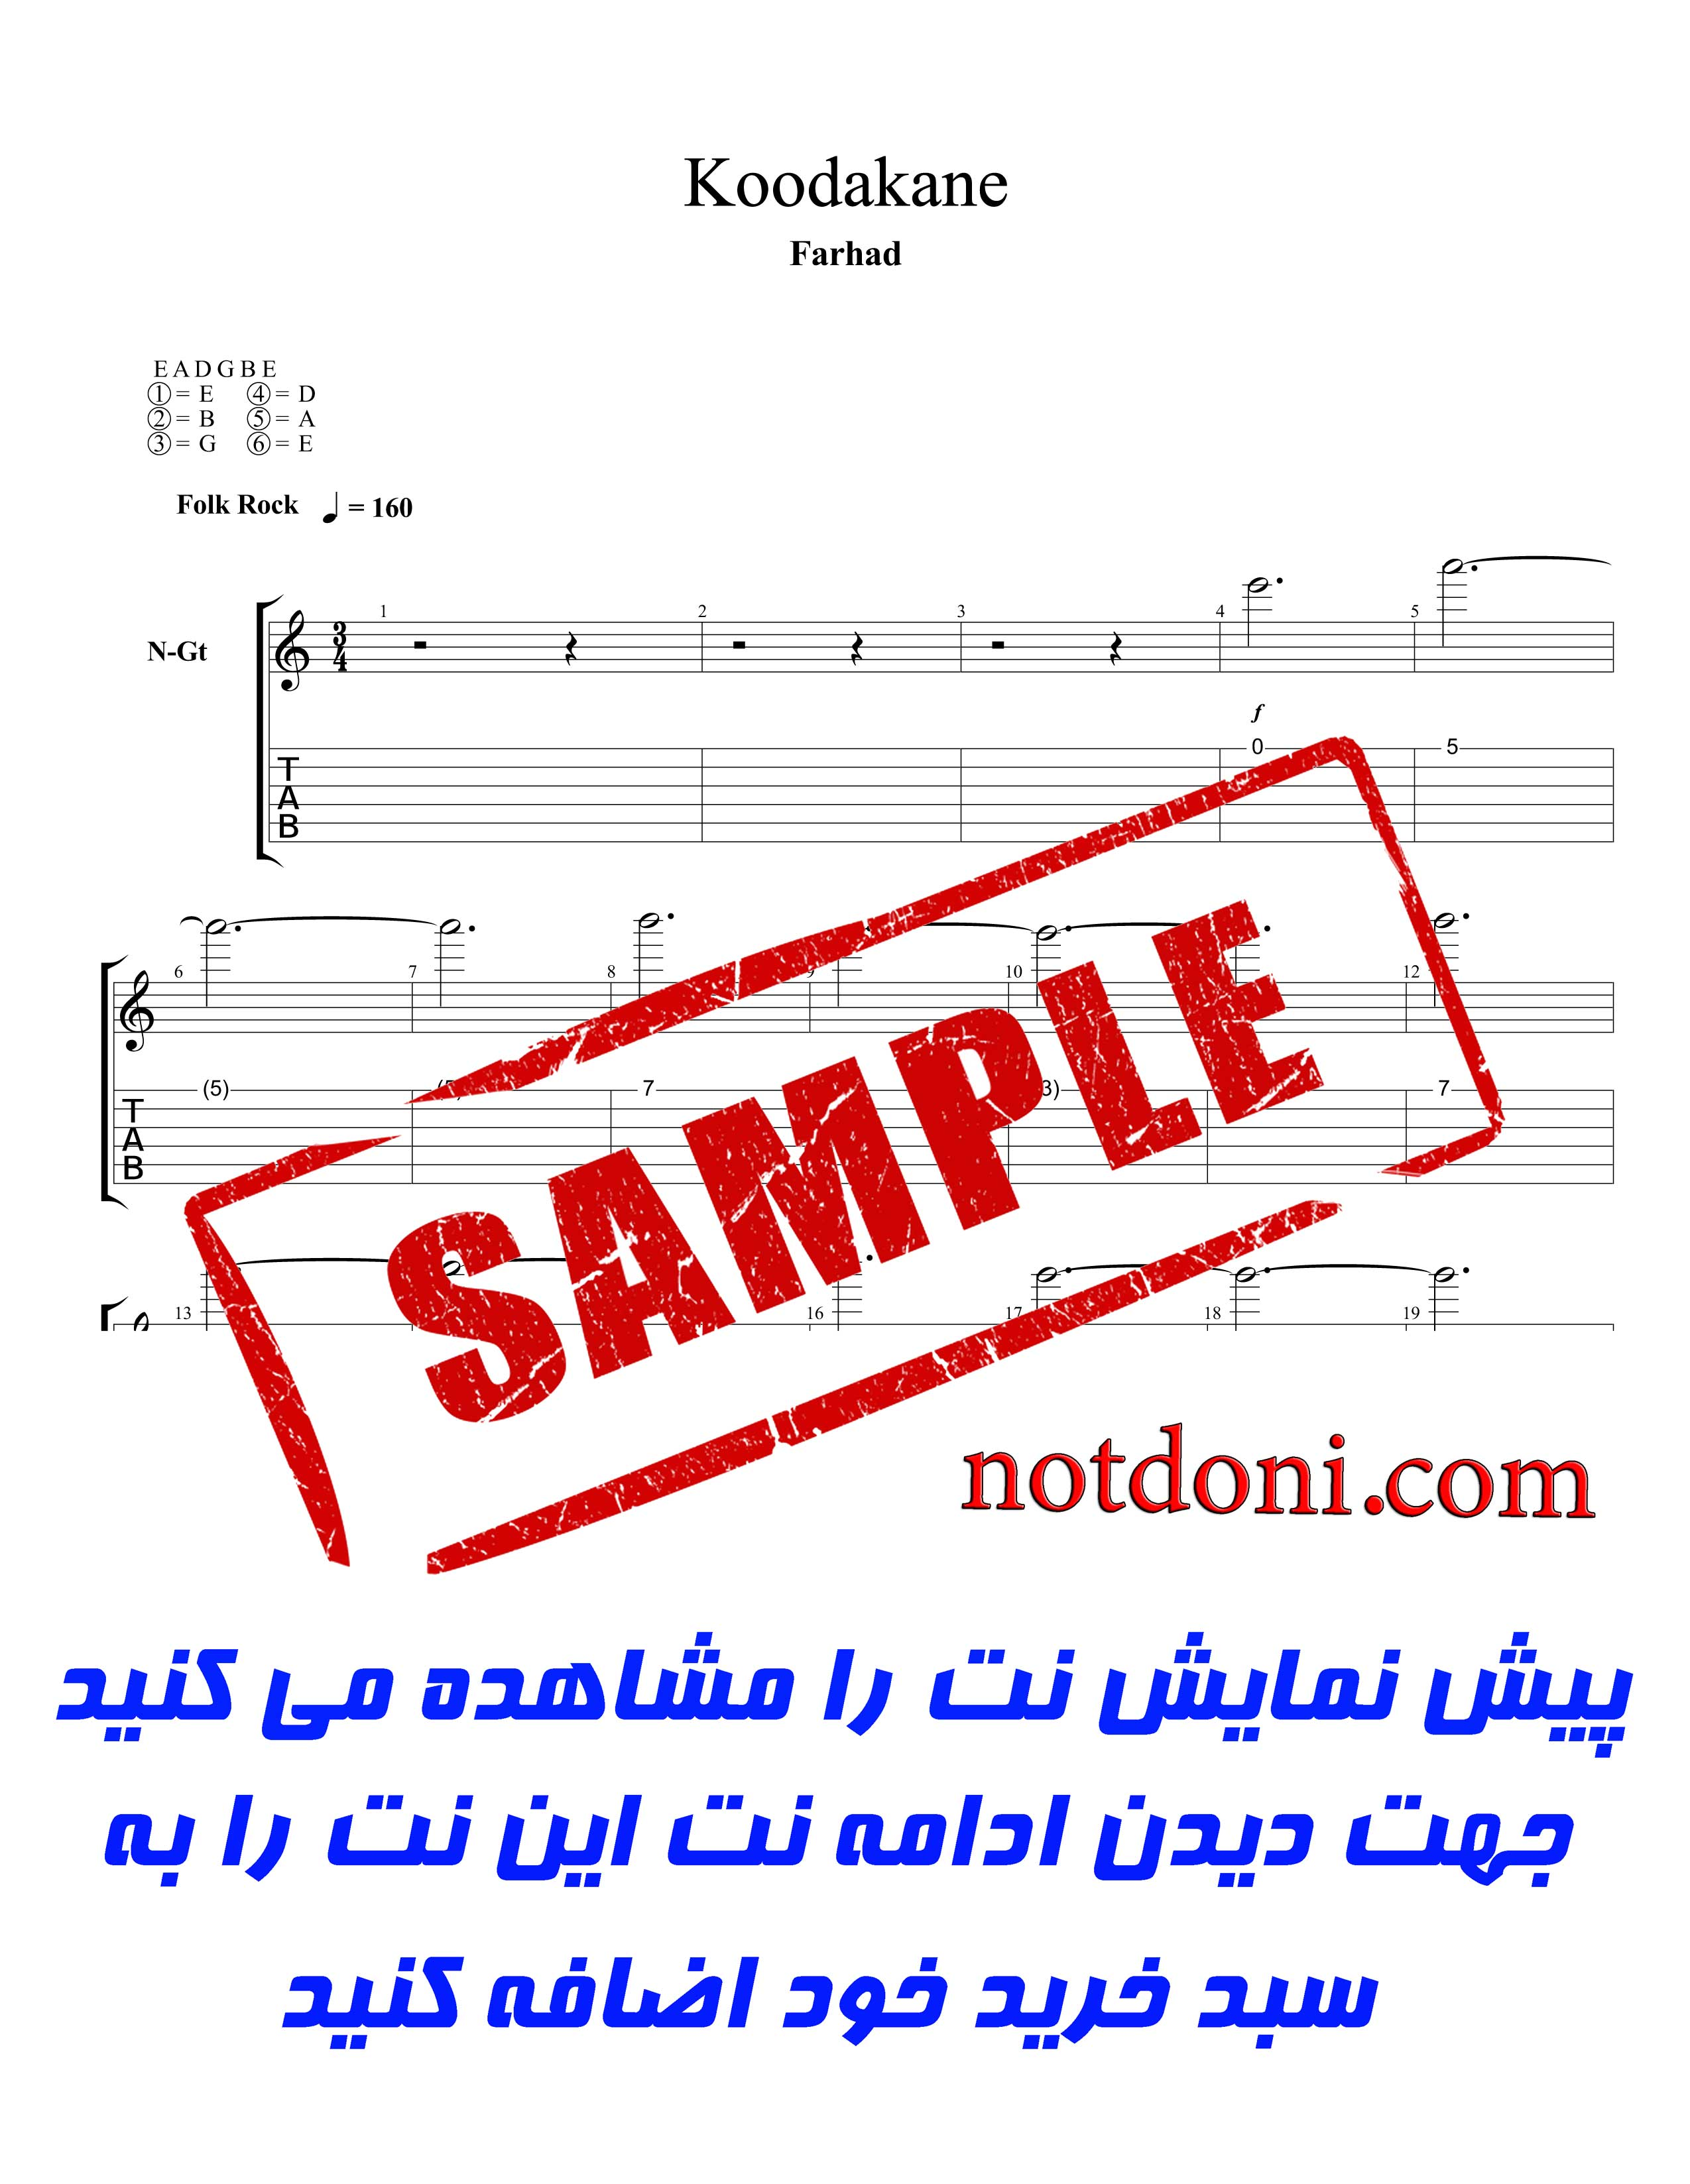 6ab5b2d8-10b4-4ce8-b3b5-067af928d1b5_دمو1.jpg